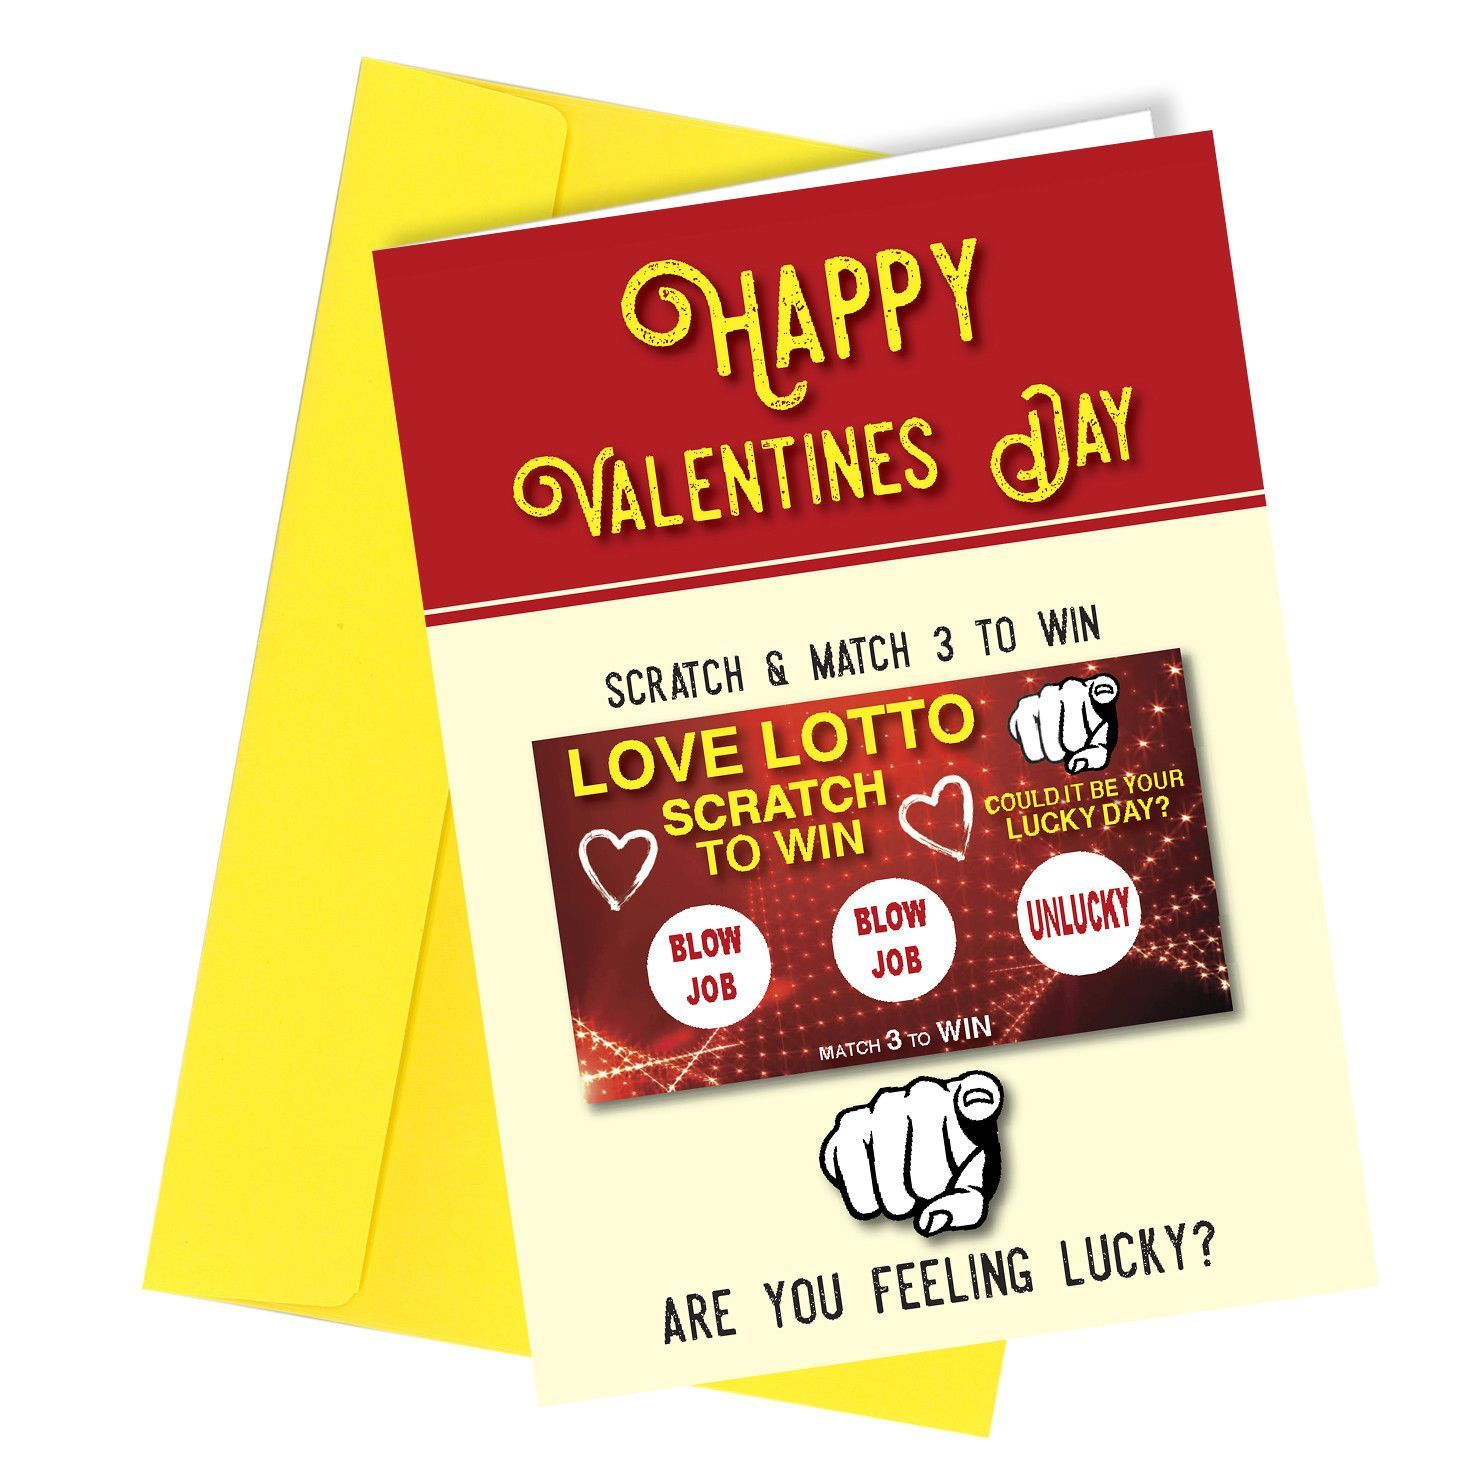 Love Lotto - #68 Unlucky (Loose)